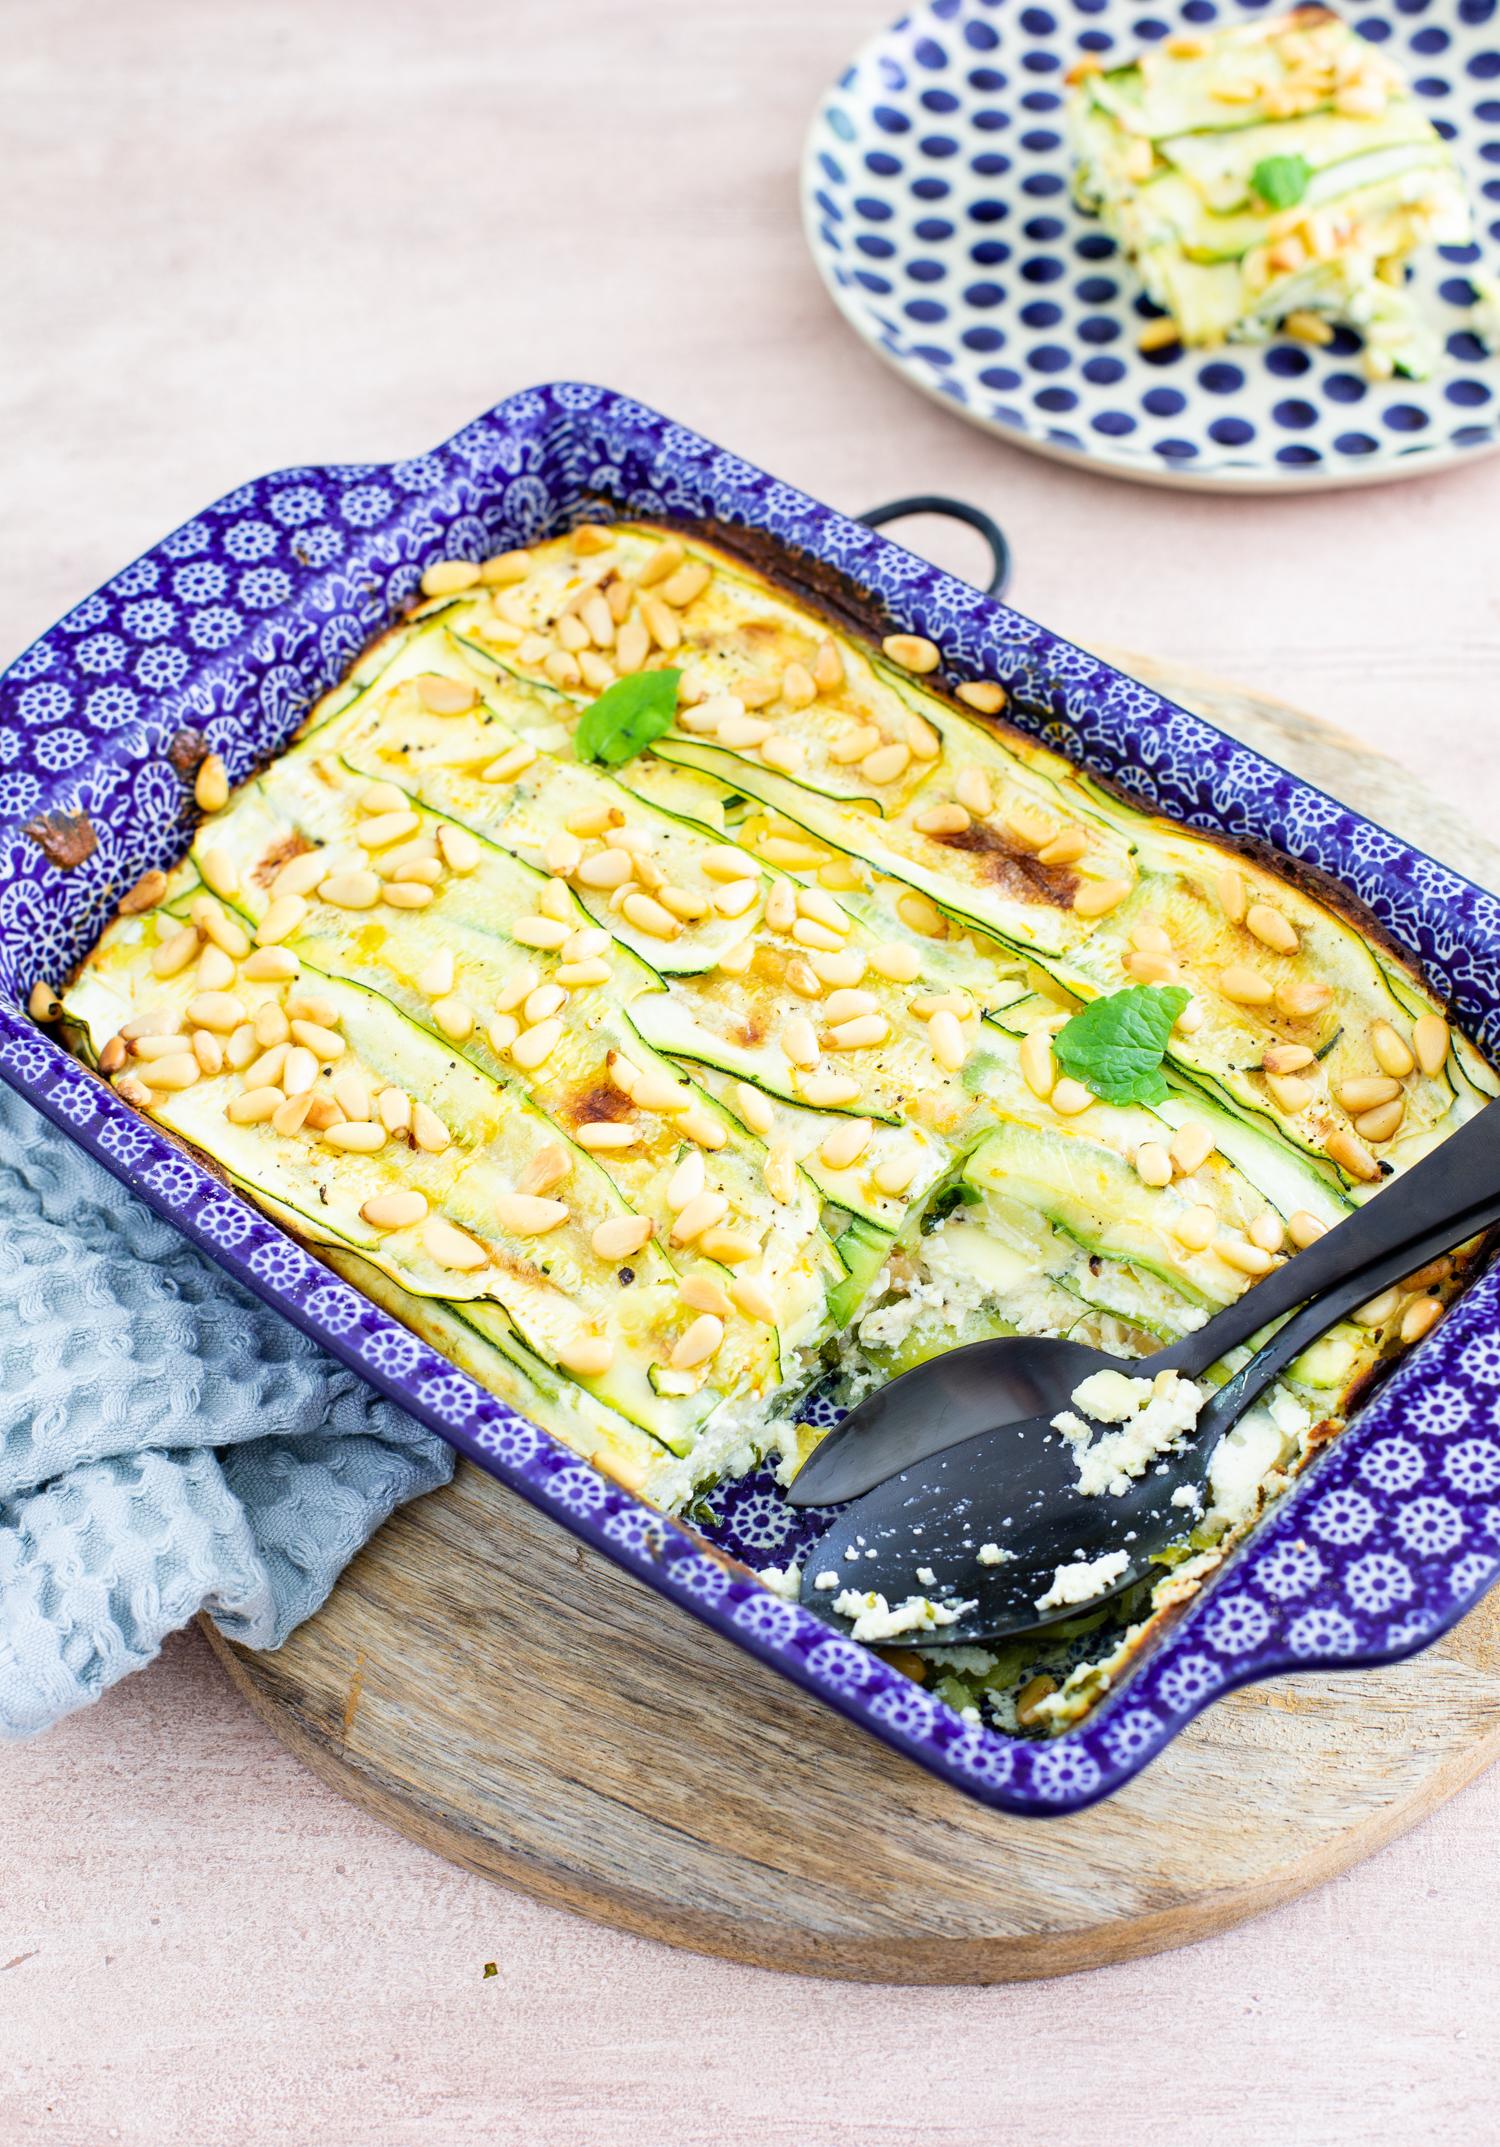 Zucchini and ricotta bake